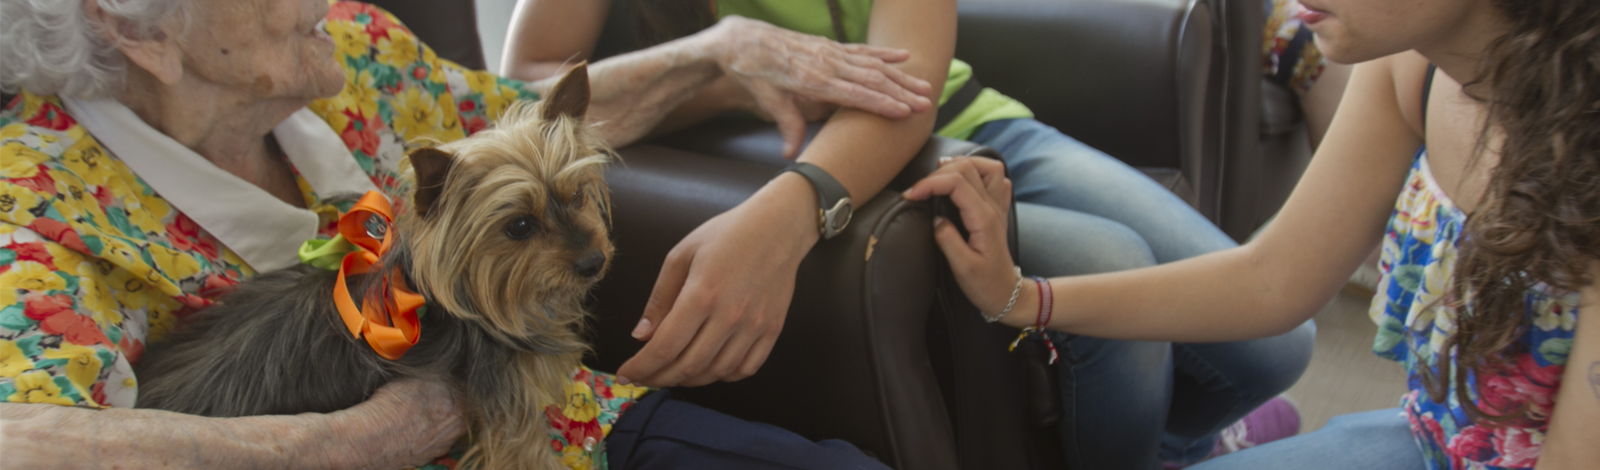 Terapia_asistida_con_animales_0027_humanymal